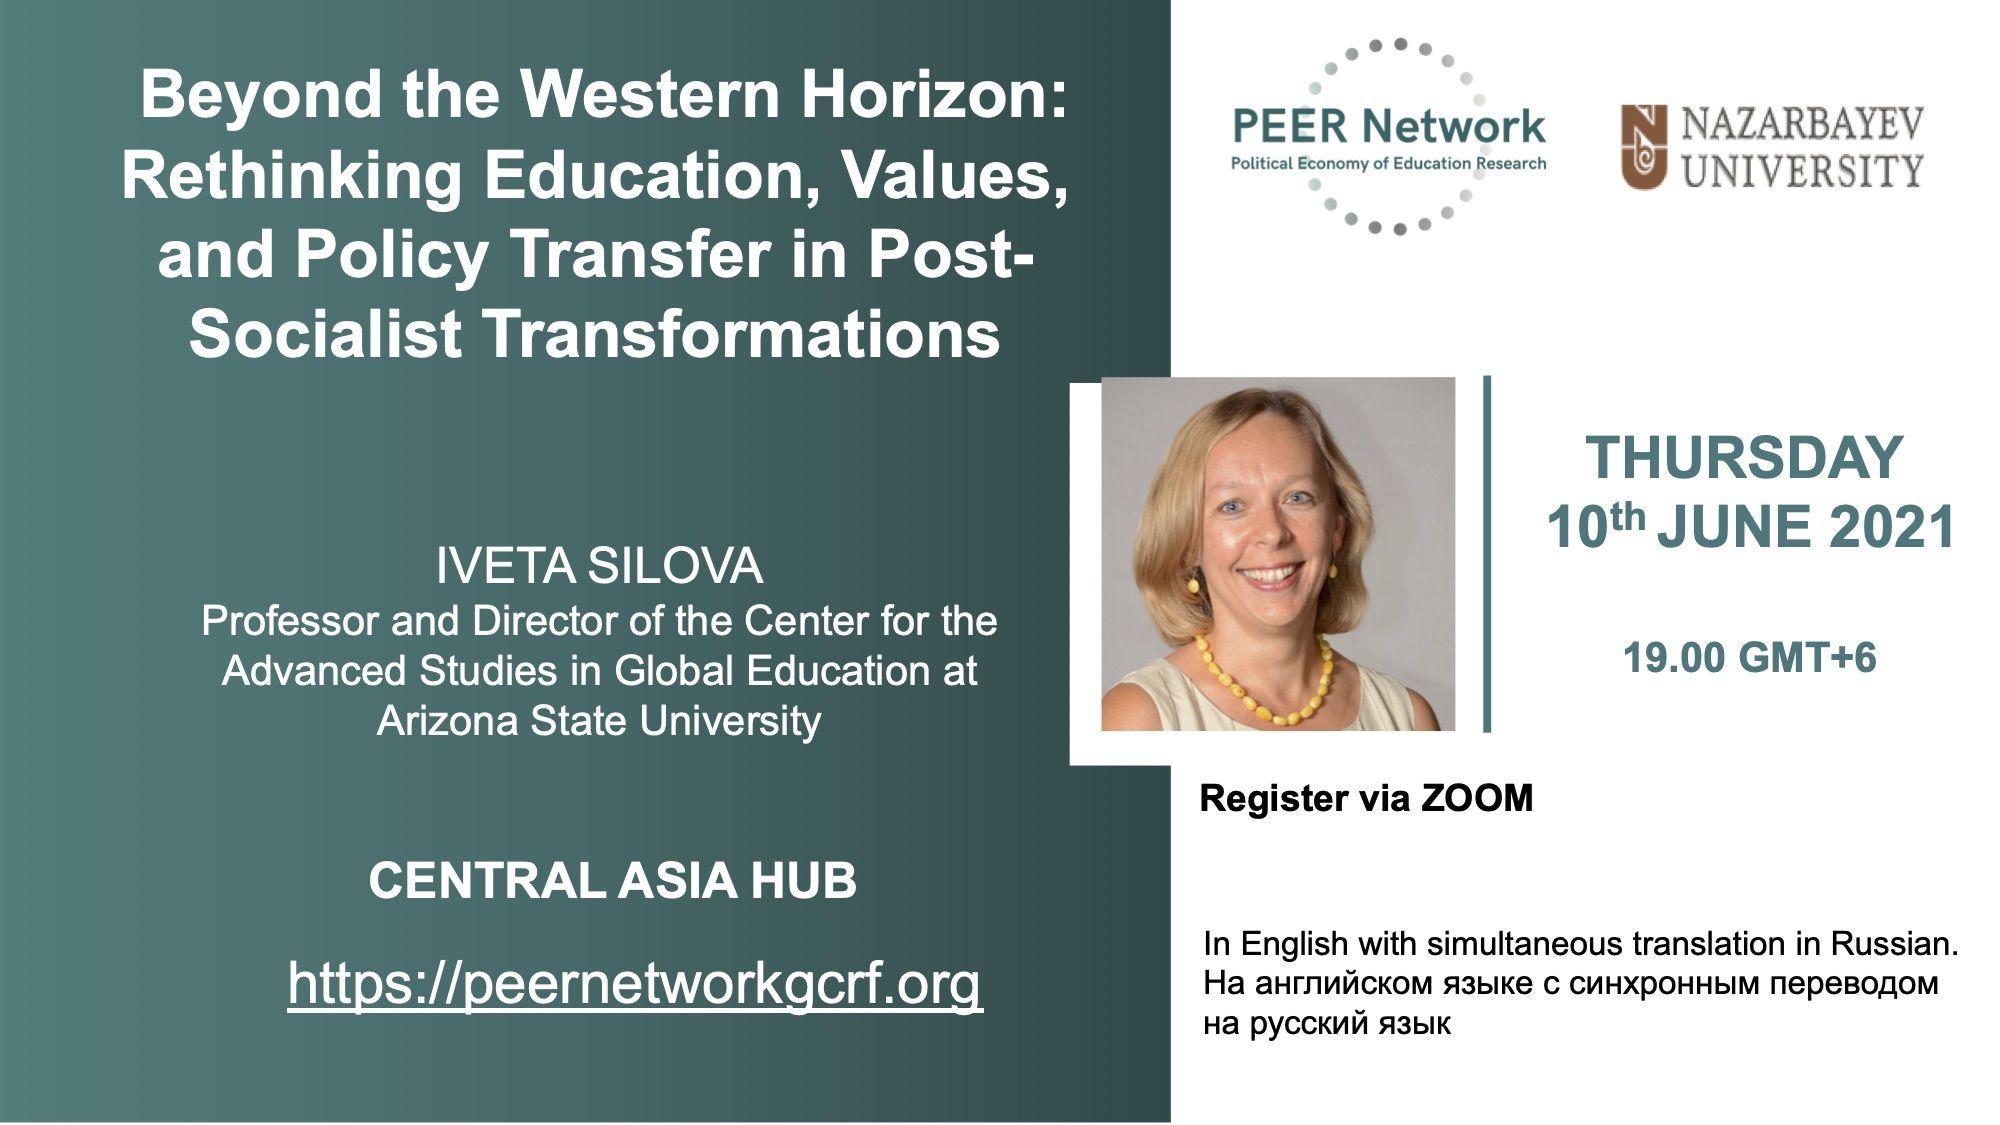 10th of June seminar poster in English